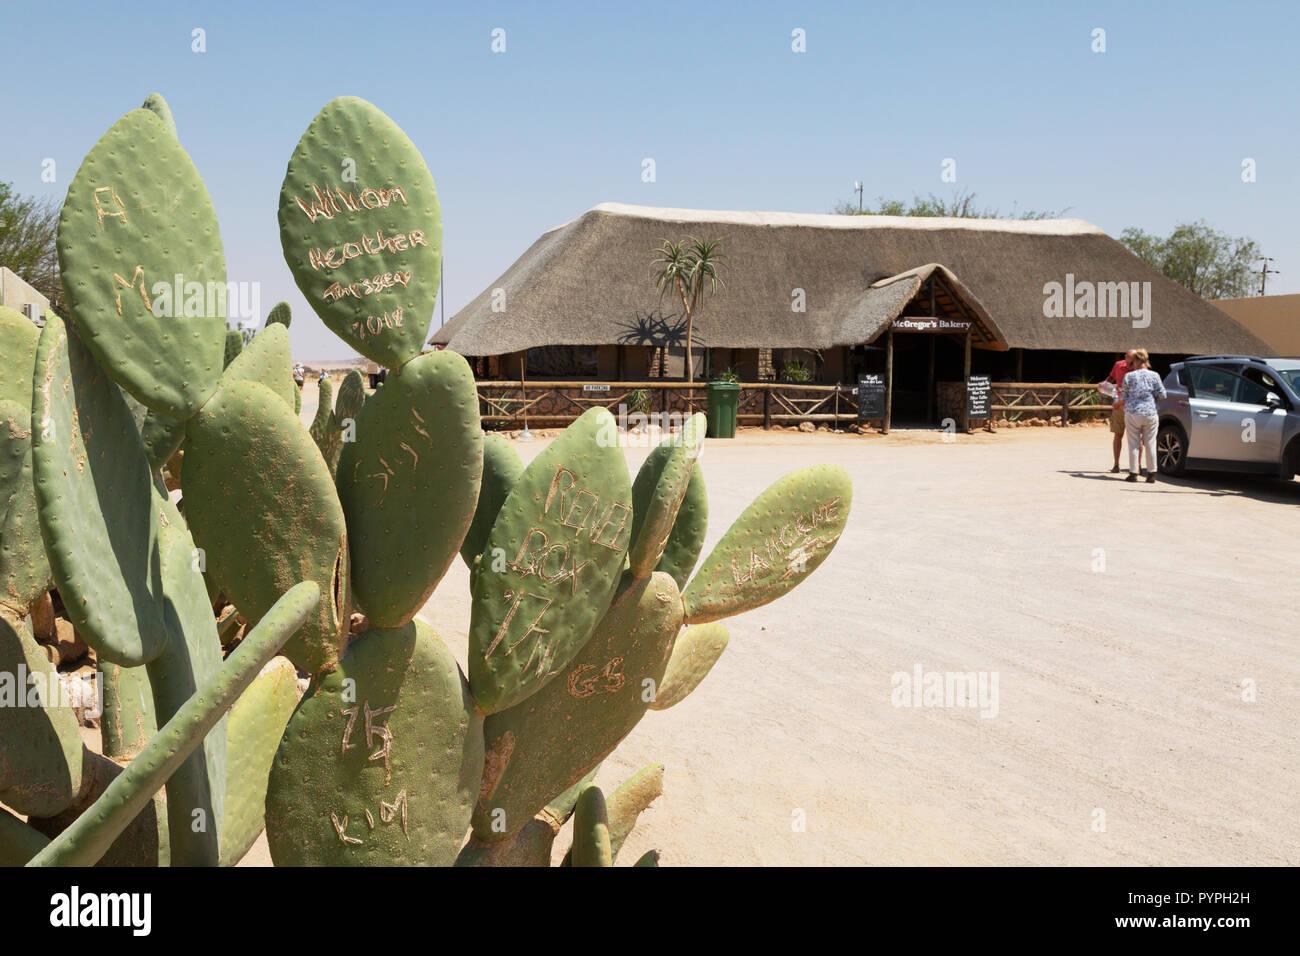 Namibia travel - graffiti on cacti outside Mcgregor's bakery, Solitaire, Namibia Africa - Stock Image